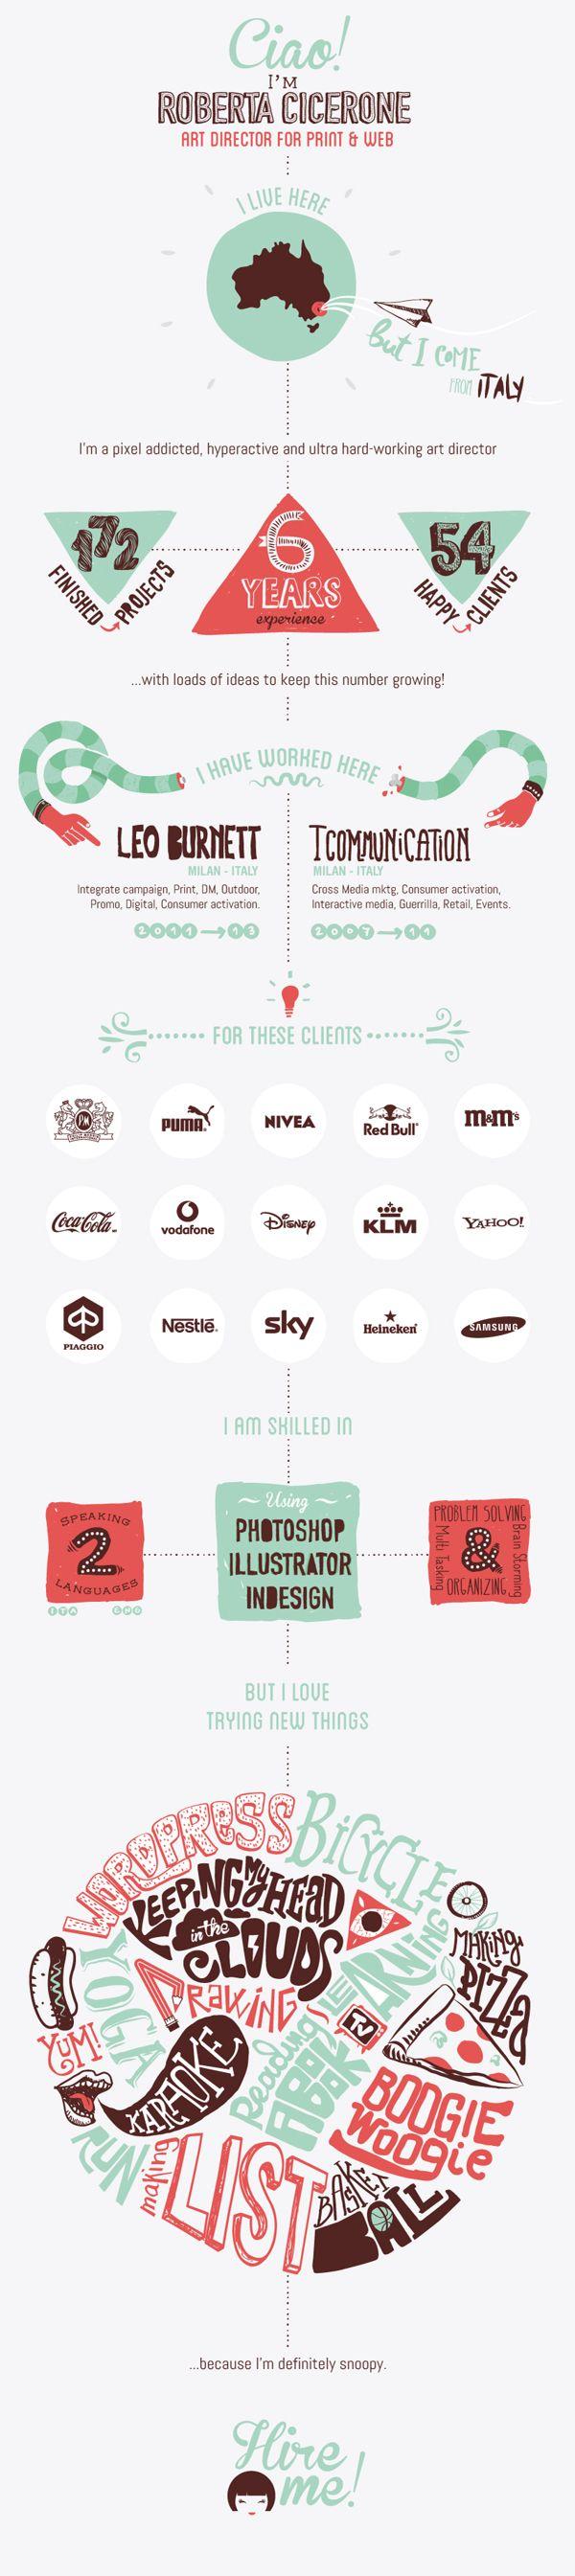 A Graphic Designeru0027s Creative Infographic Style Resume